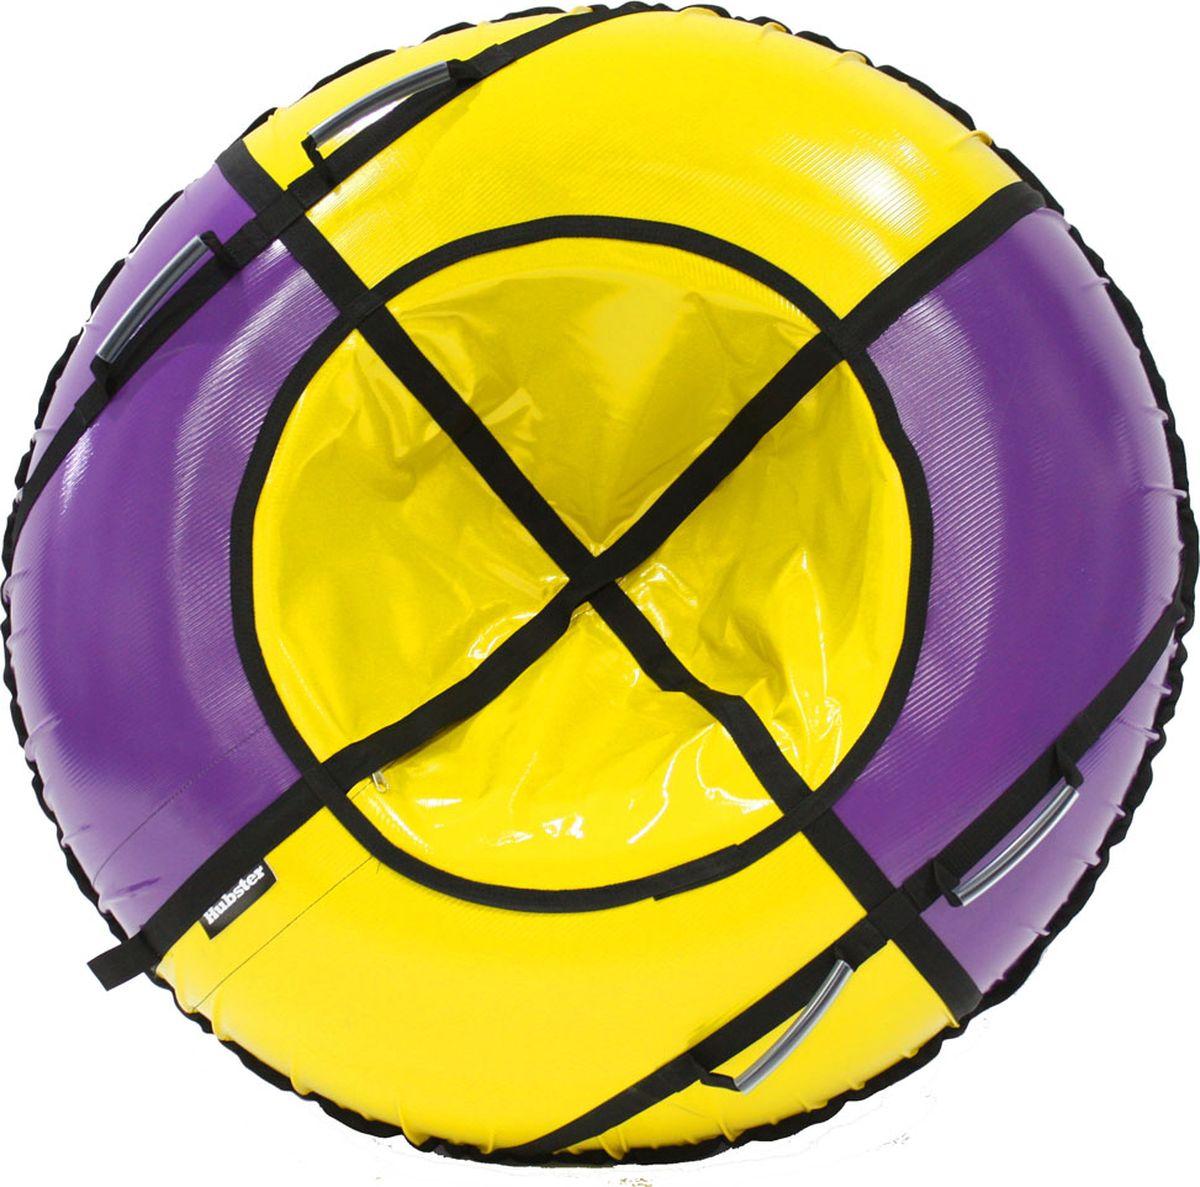 "Тюбинг Hubster ""Sport Plus"", цвет: фиолетовый, желтый, диаметр 120 см"